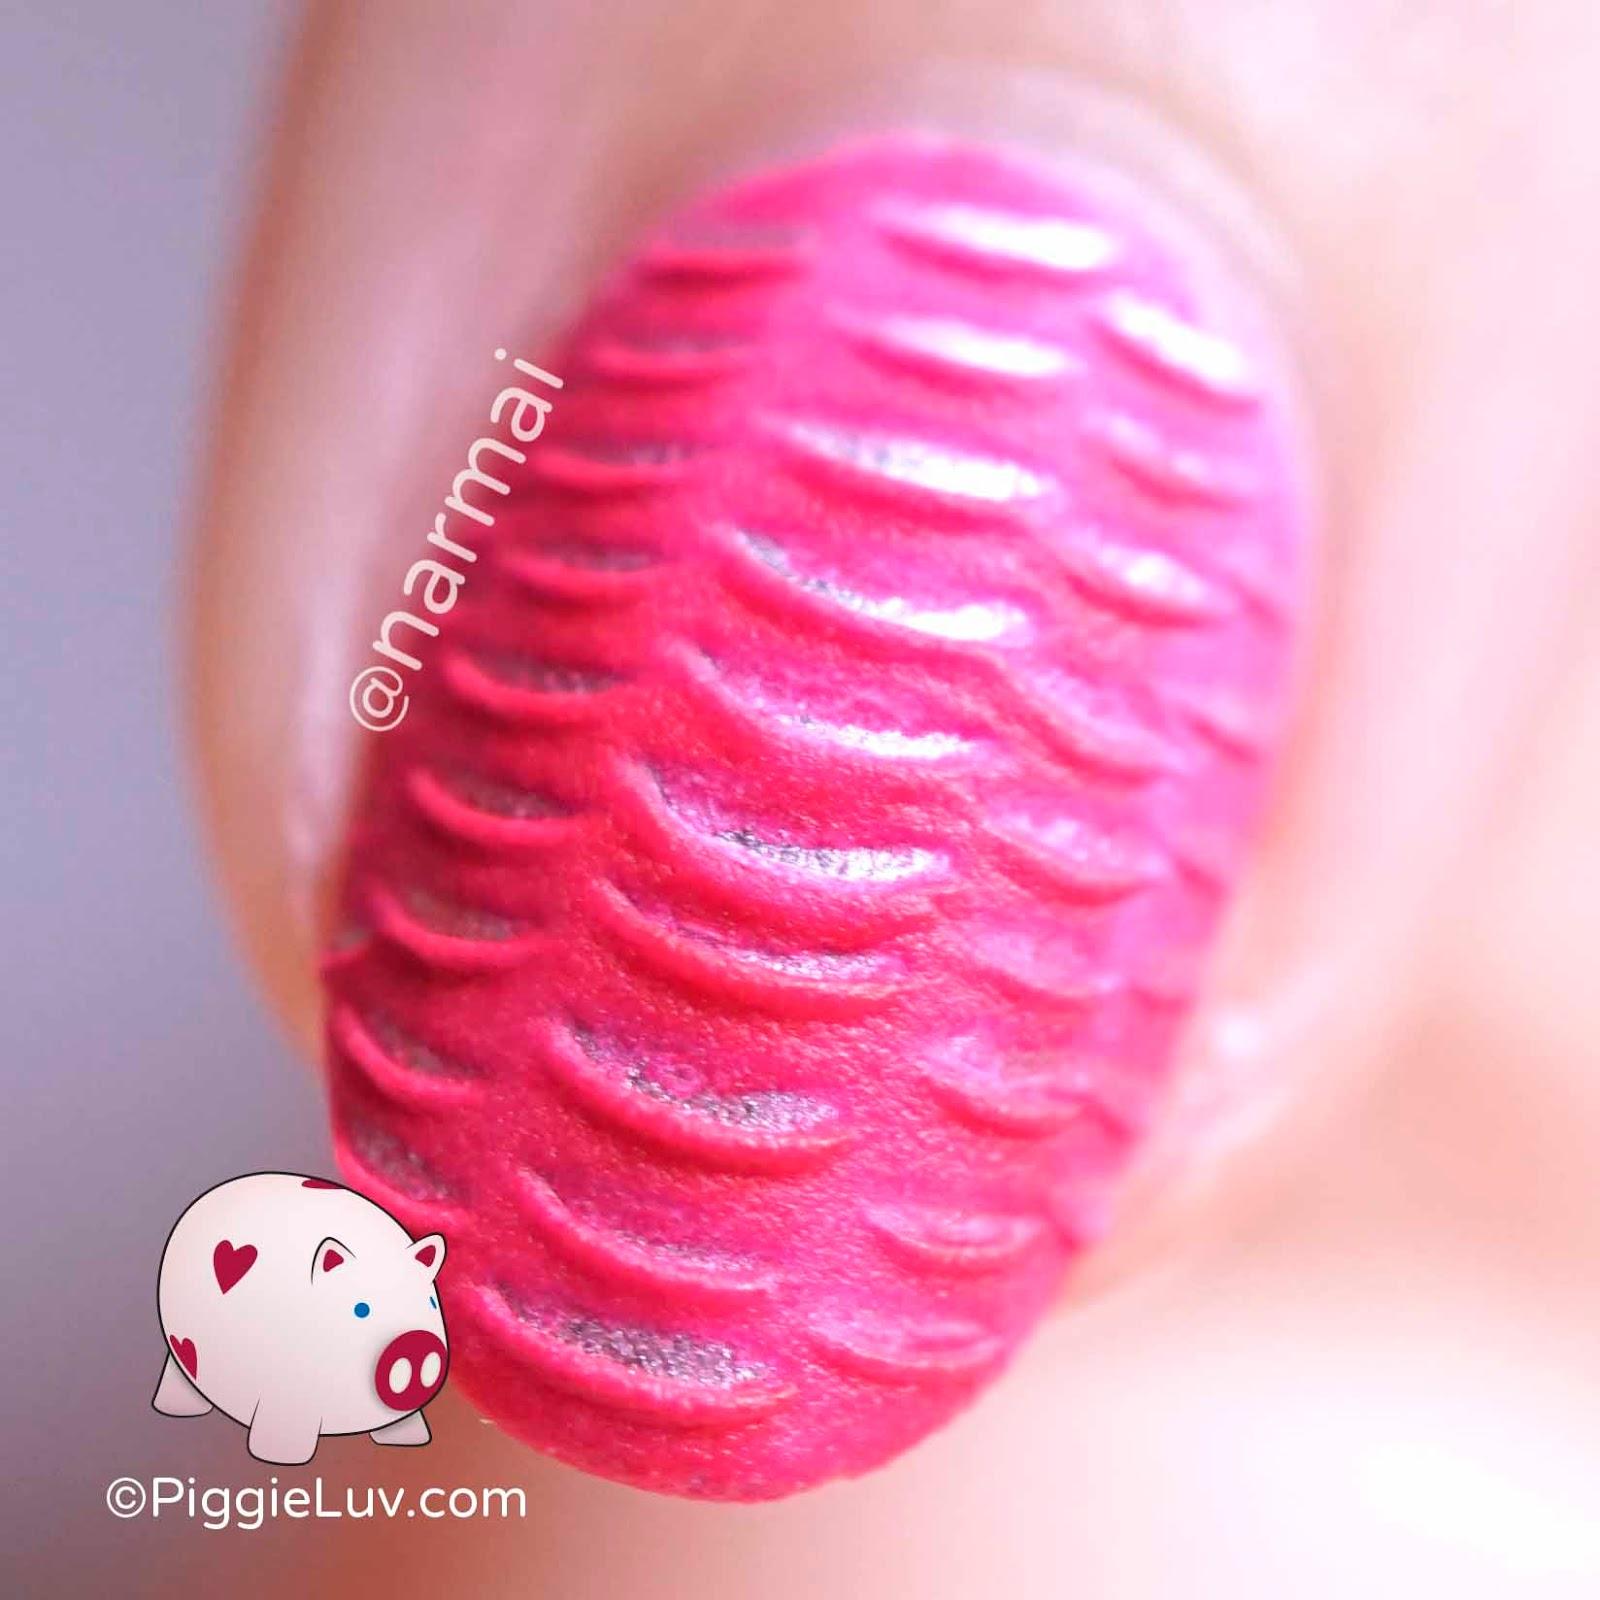 Piggieluv Nail Art Using Silicone Brushes